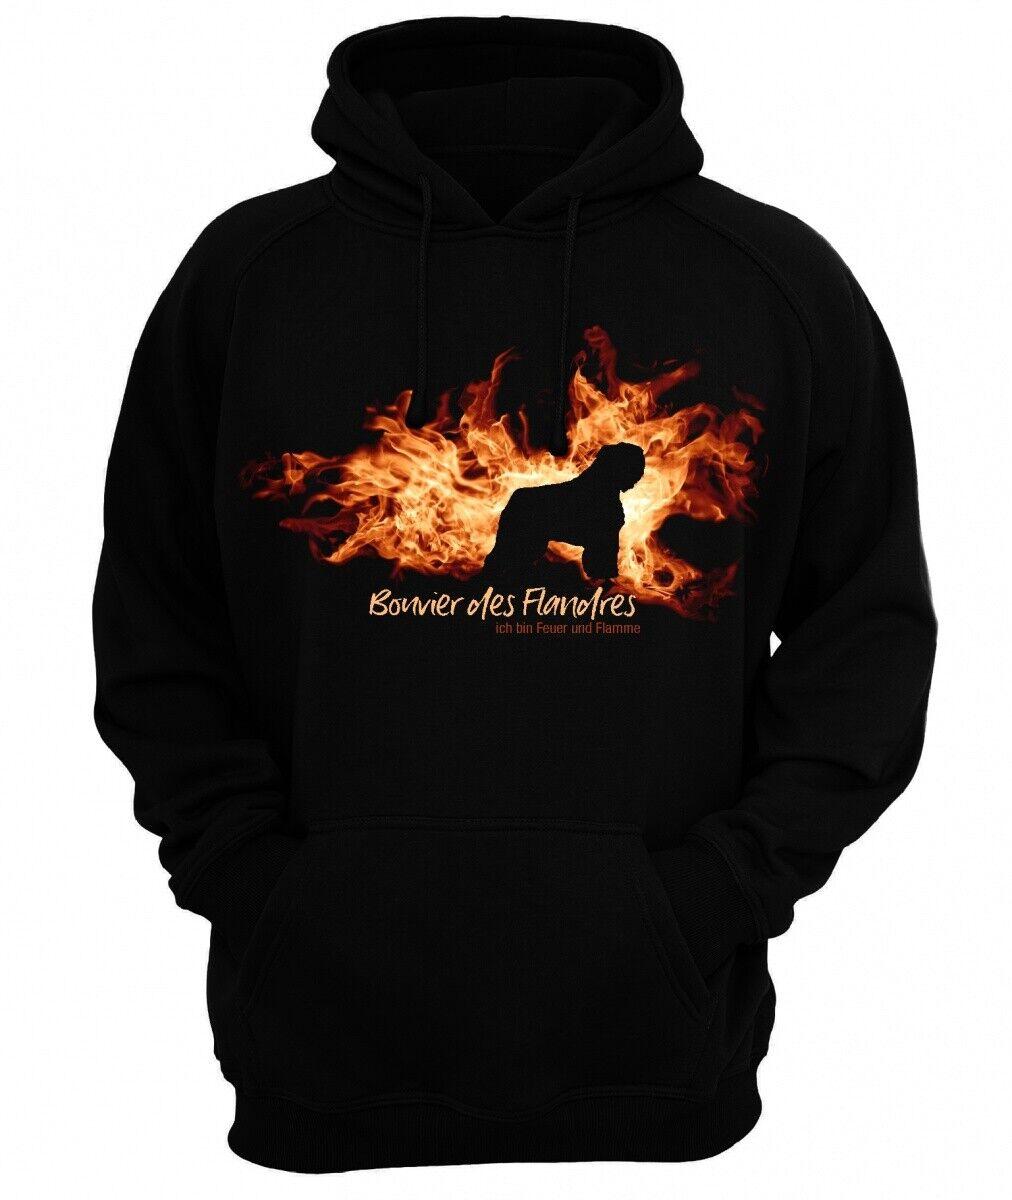 7a9172e3c BOUVIER DES FLANDRES FEUER FLAMME by Siviwonder Hoodie Sweatshirt ...